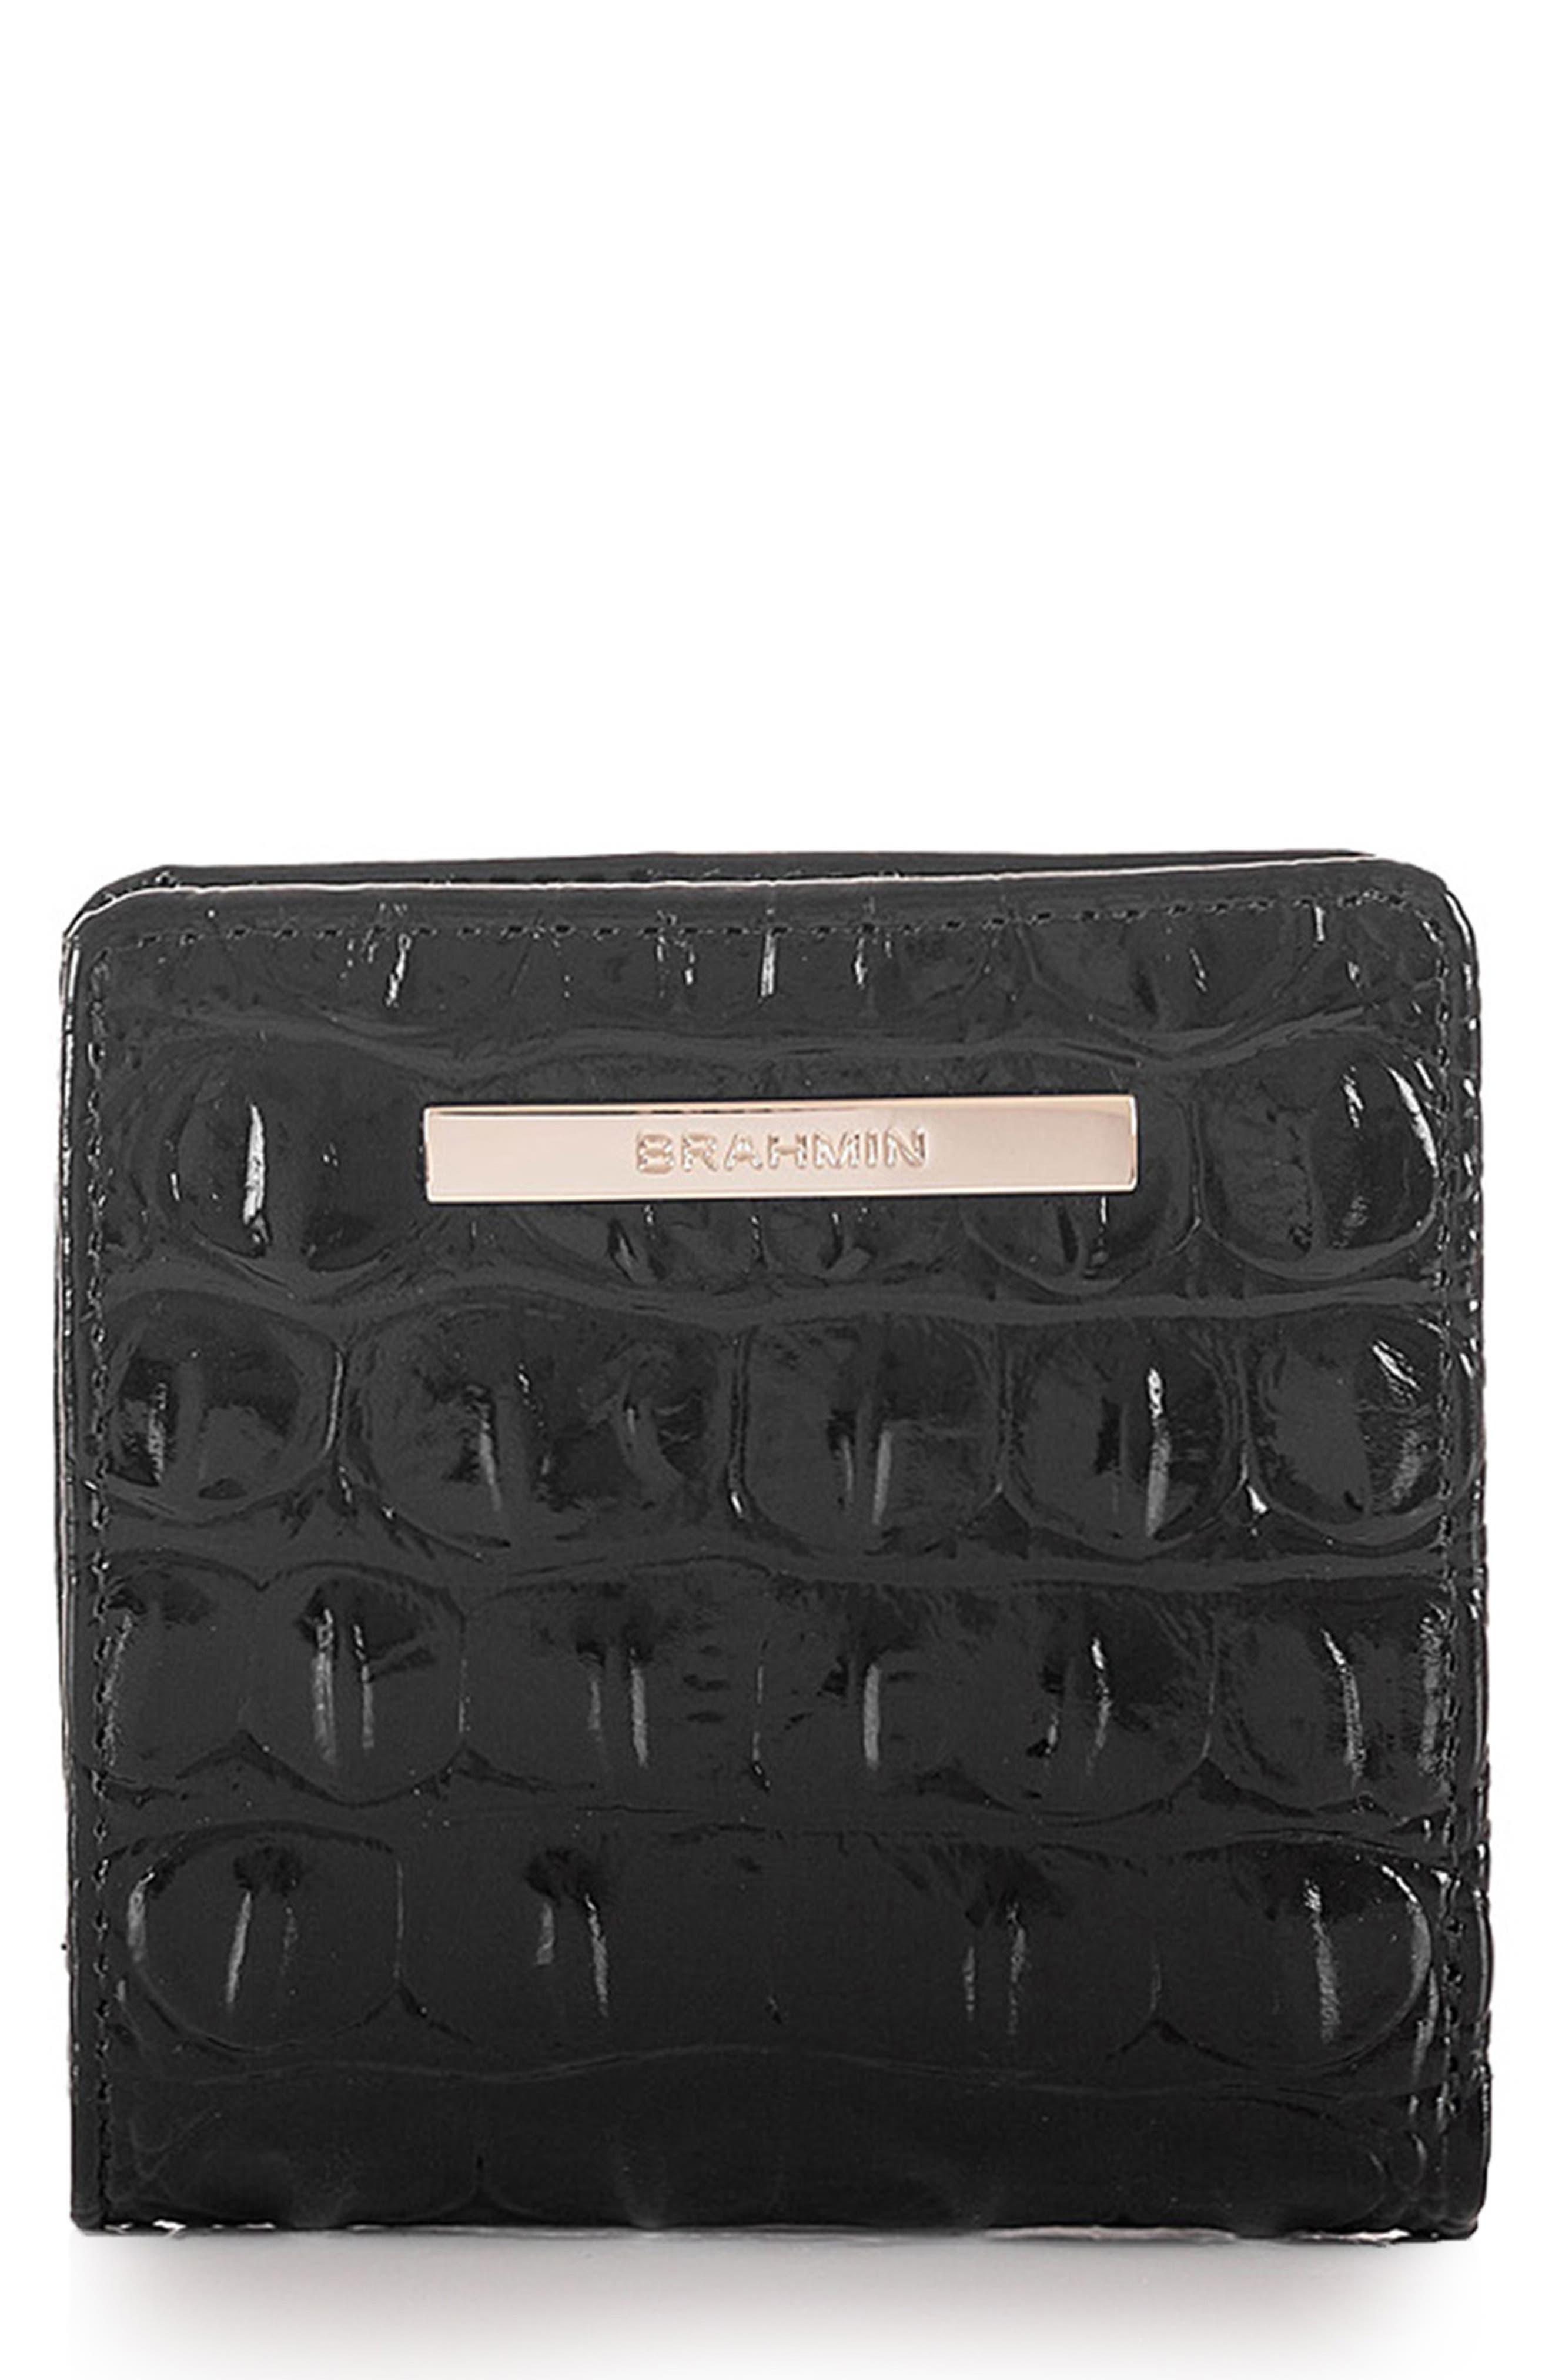 BRAHMIN, Jane Croc Embossed Leather Wallet, Main thumbnail 1, color, BLACK MELBOURNE